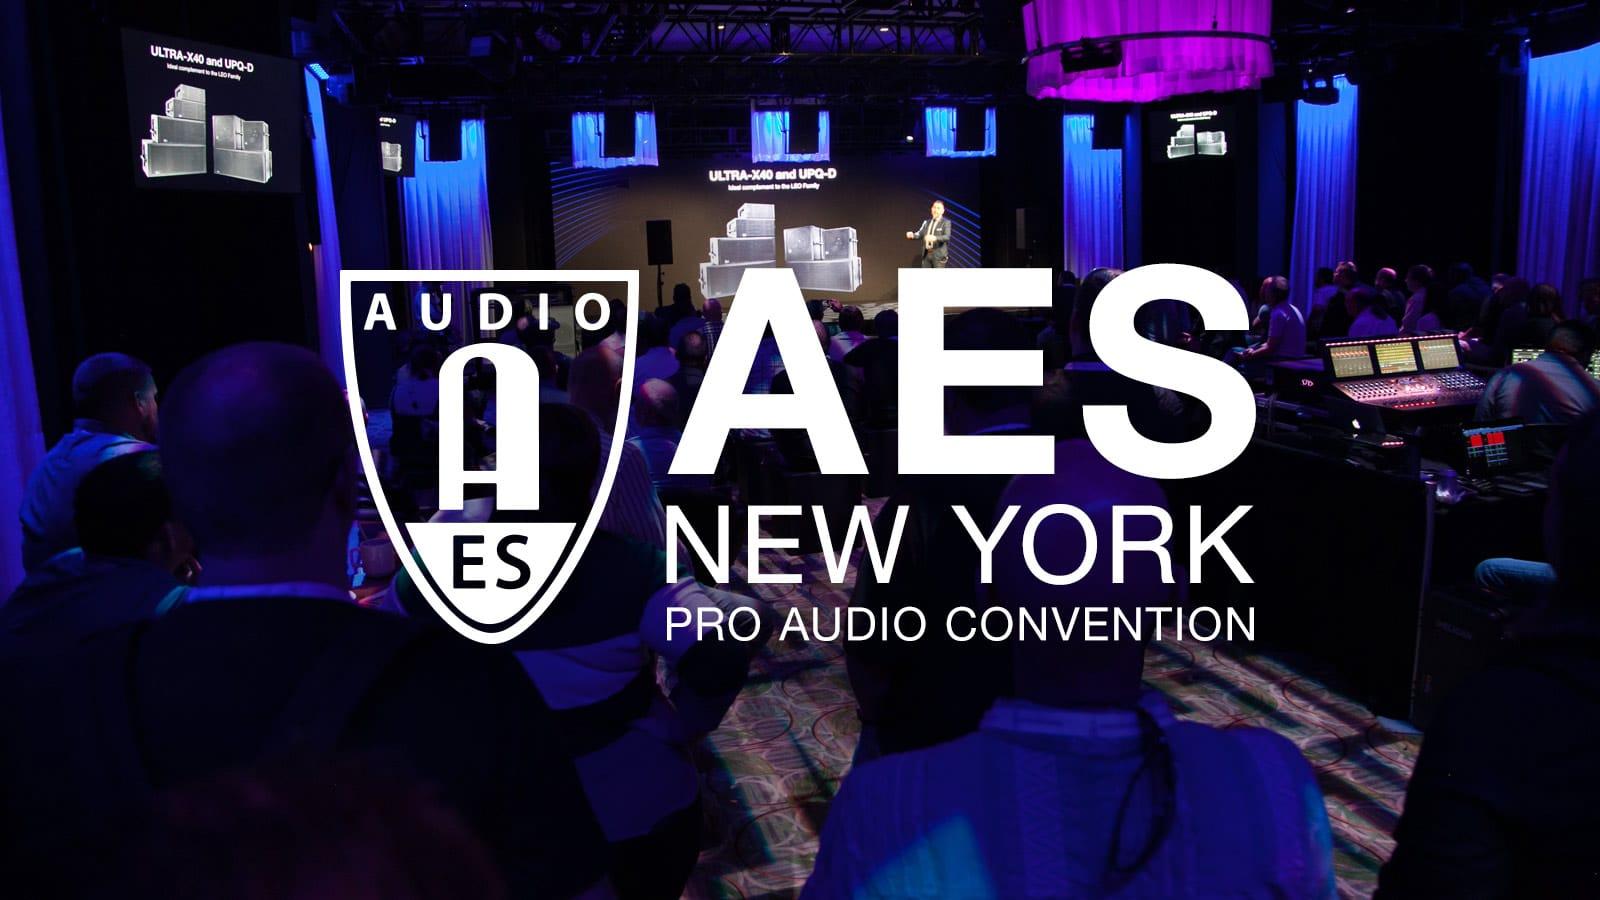 aes 2020 new york